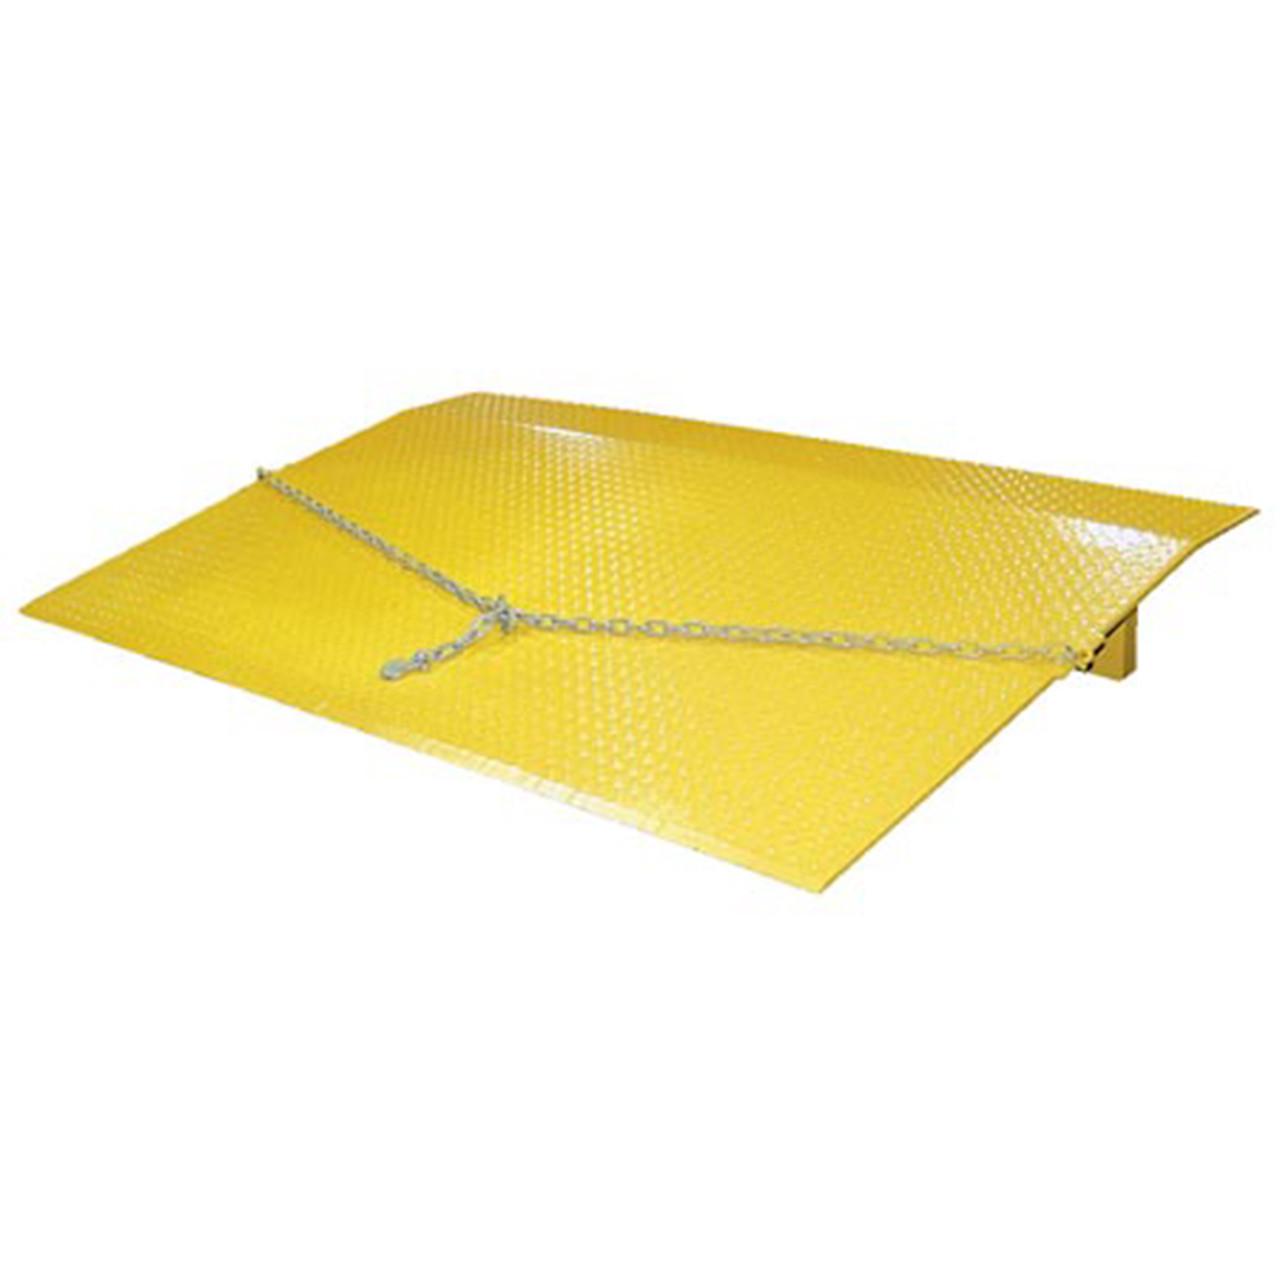 Steel Dockplate